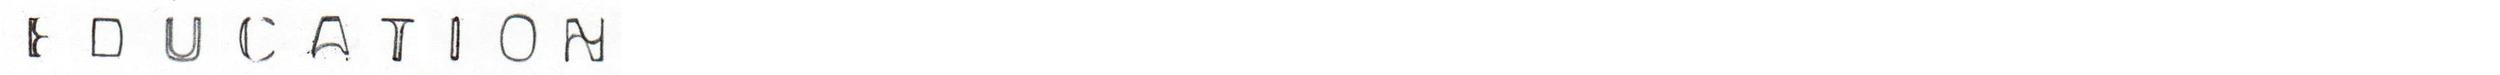 2011-2012 Master studies, Jewellery+Corpus, Konstfack University College of Arts, Crafts & Design, Stockholm, Sweden 2008-2011 BA Visual Art, Oslo National Academy of the Arts (KHiO), Norway 2010 Fine Art (exchange), Saimaa University of Applied Sciences, Imatra, Finland 2005-2008 Metalwork/Corpus, Leksands folkhögskola, Leksand, Sweden